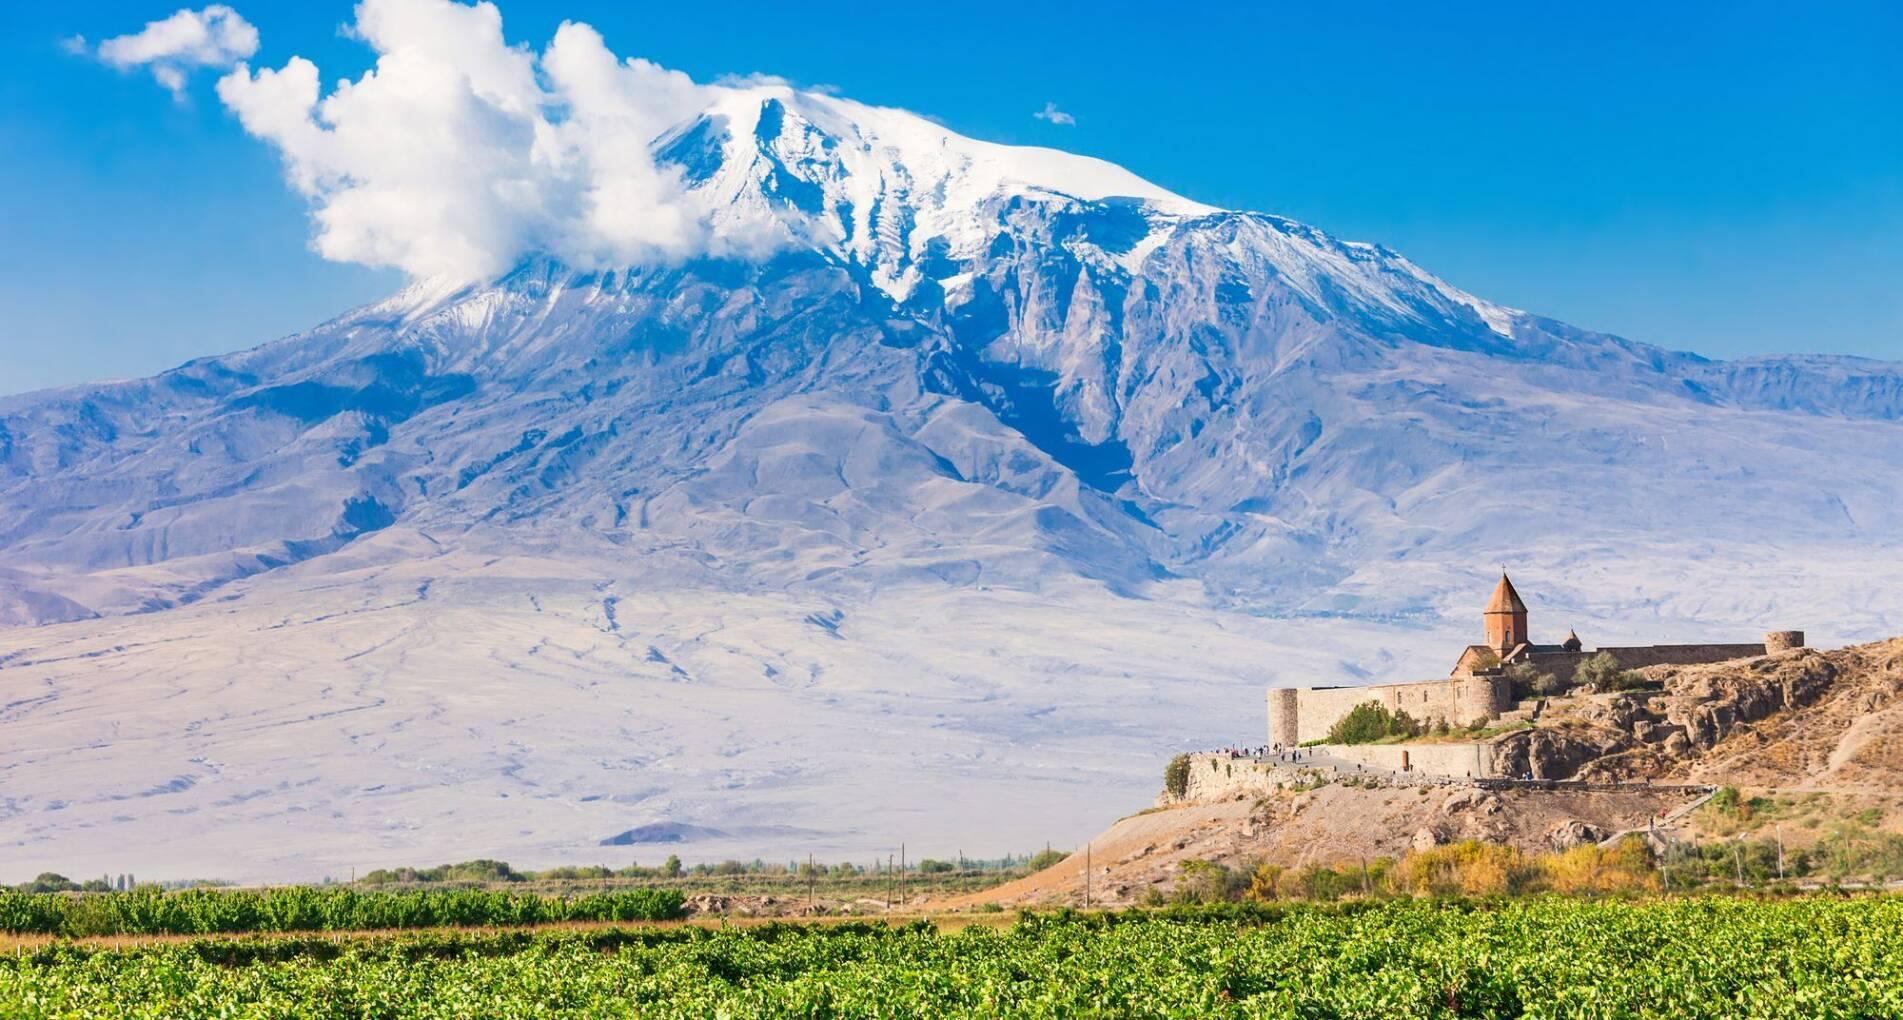 Rondreis Georgië & Armenië: kloosters en Kaukasus - Georgië - 1